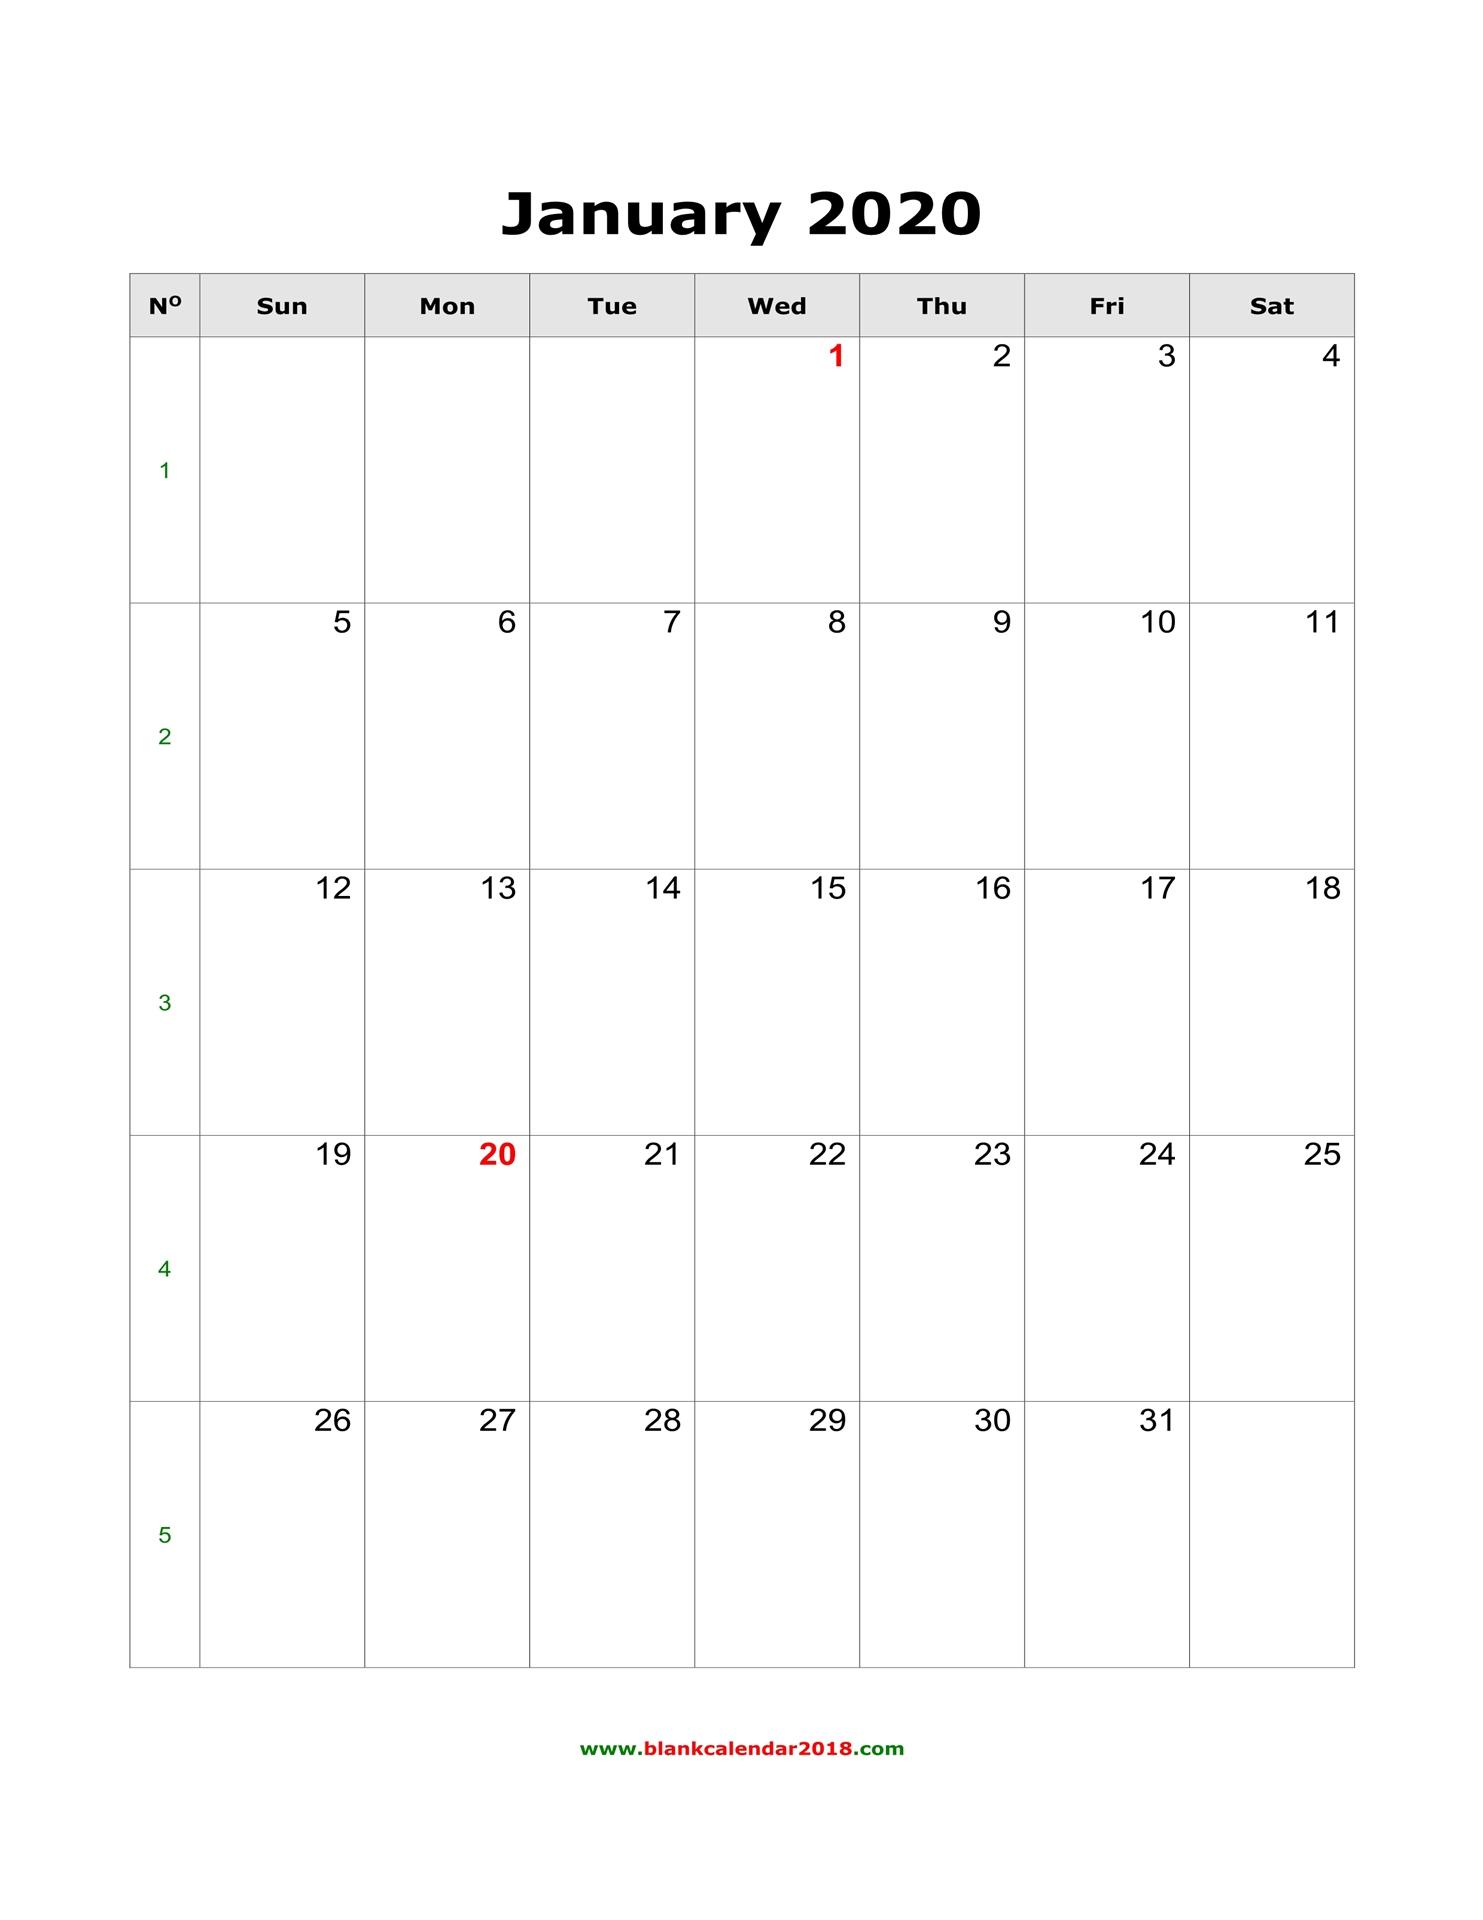 January Blank Calendar 2020 - Togo.wpart.co